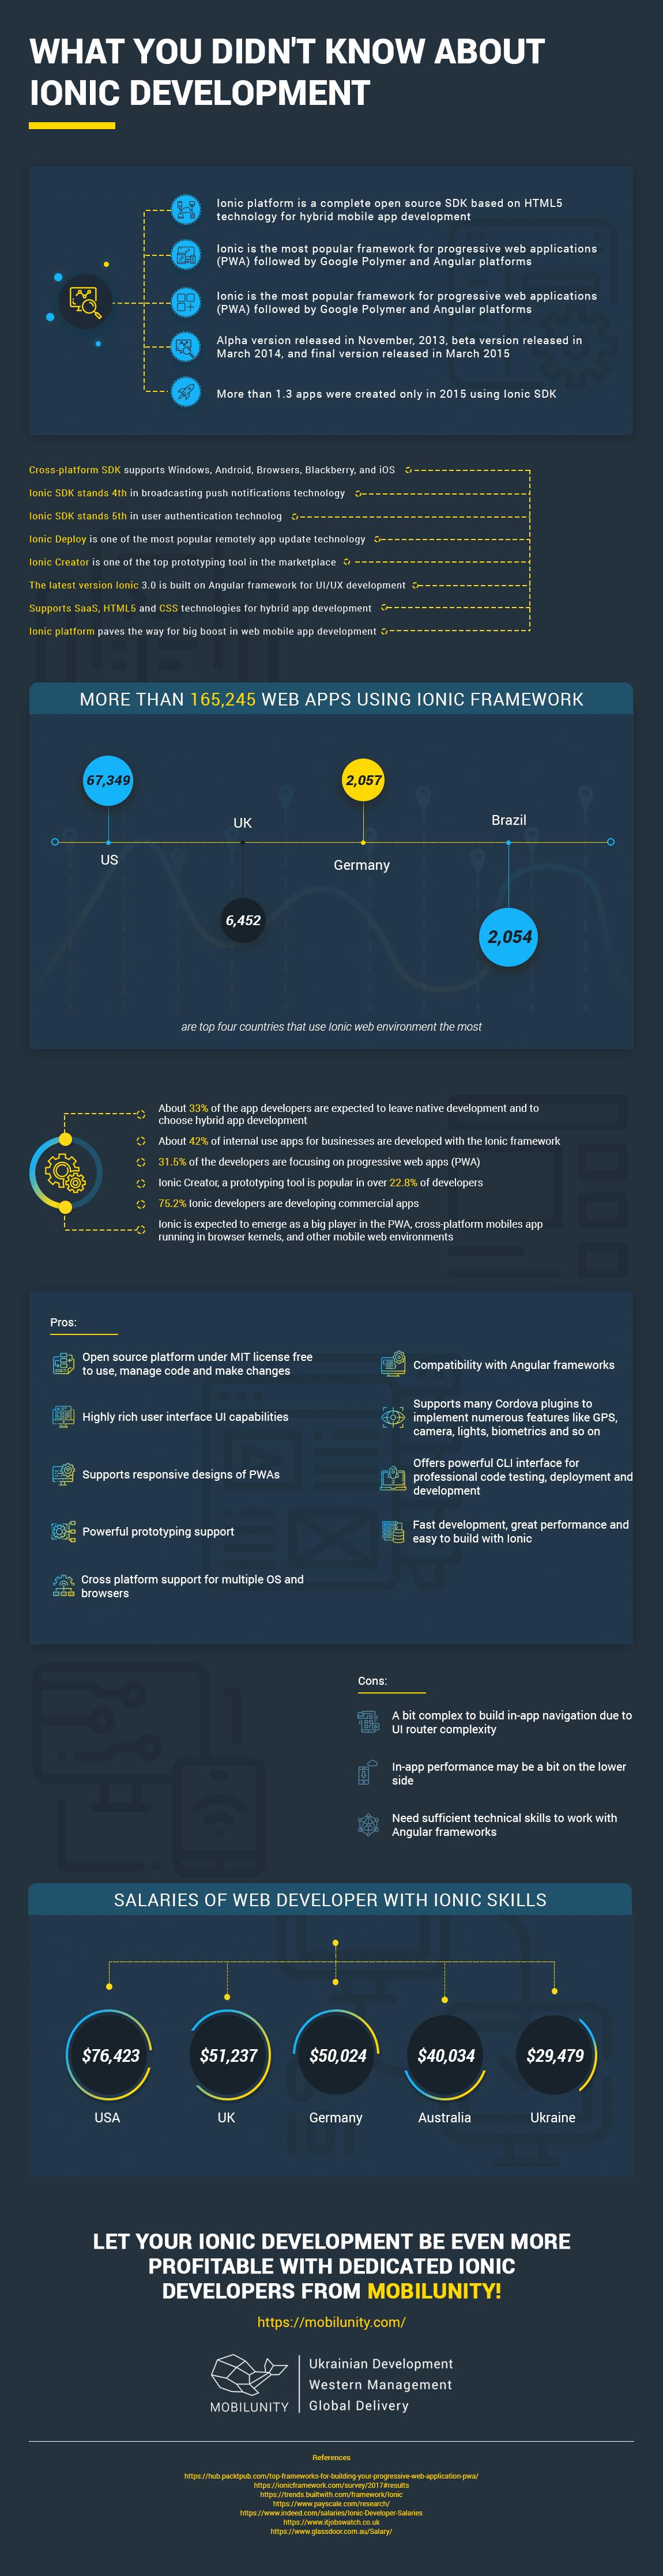 iOnic Development Infographic Article Image